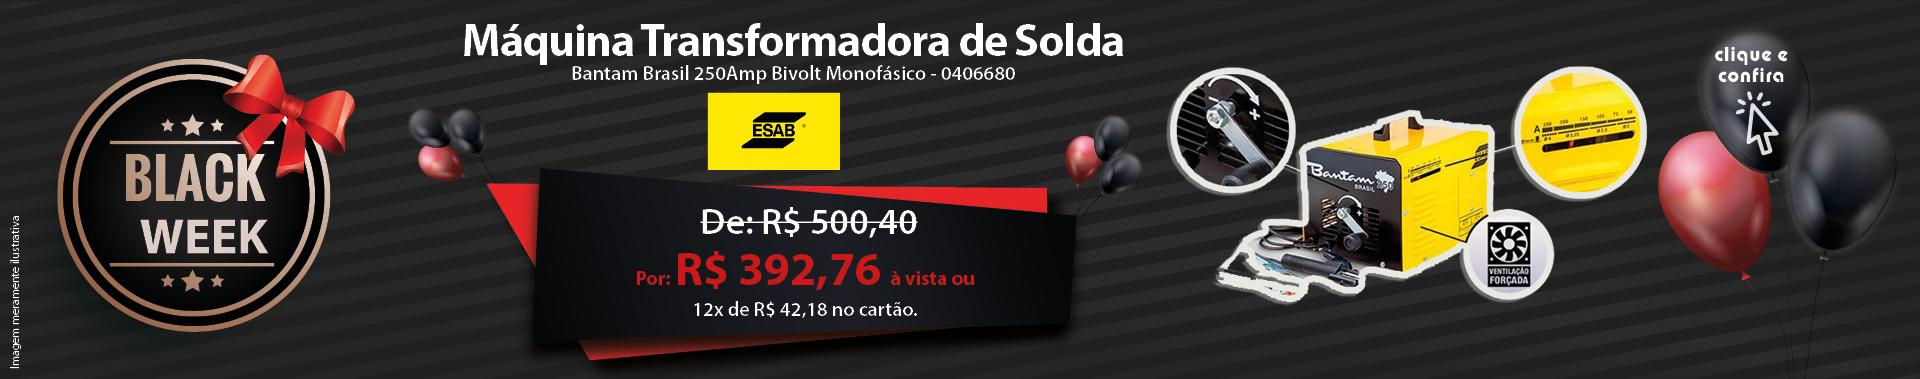 Máquina Transformadora de Solda Bantam Brasil 250Amp Bivolt Monofásico - ESAB-0406680